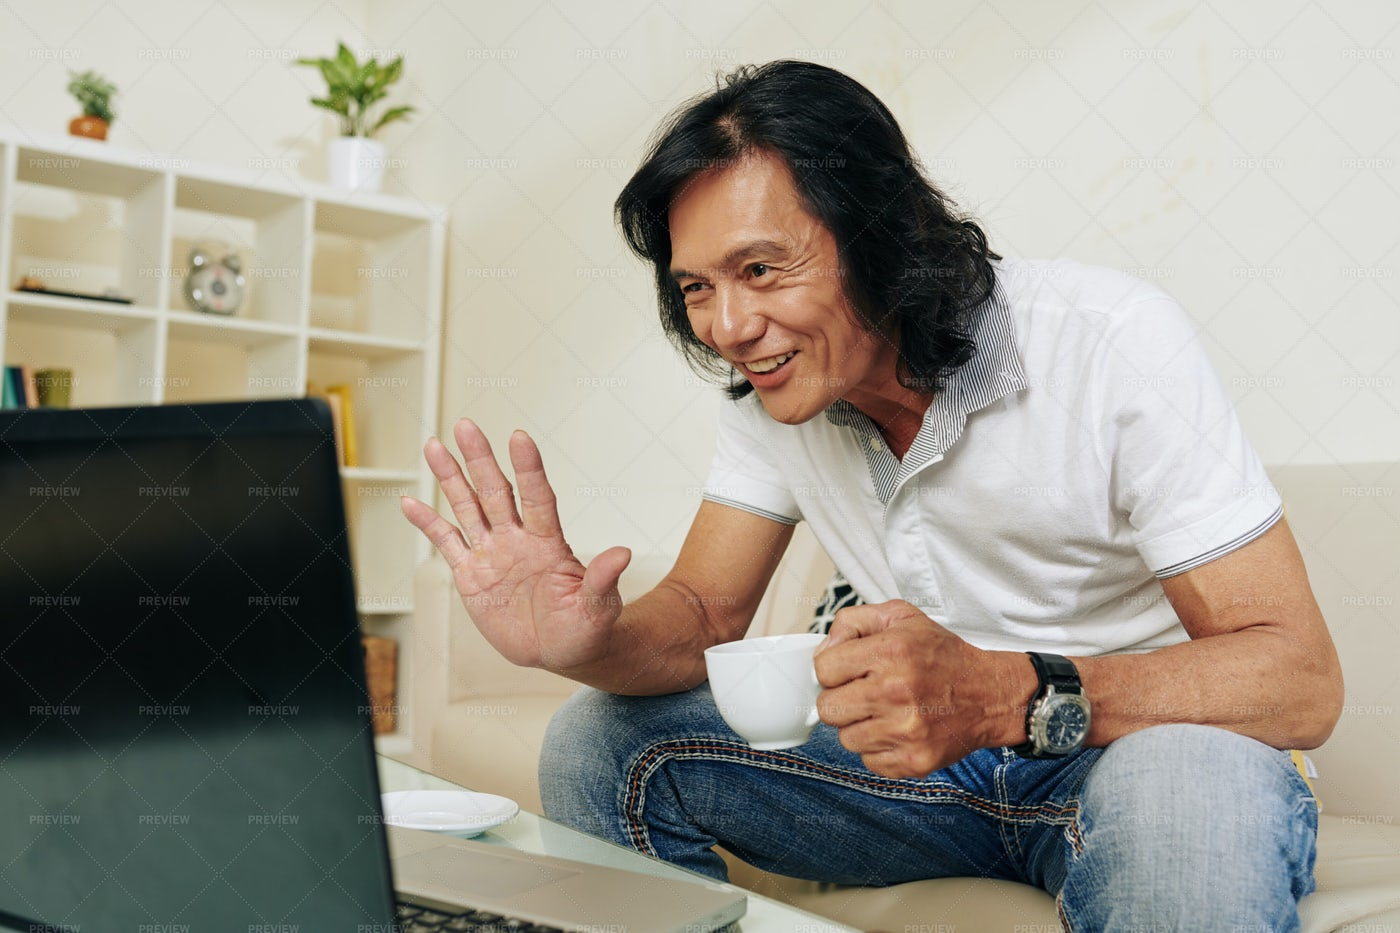 Man Video Calling Friend: Stock Photos